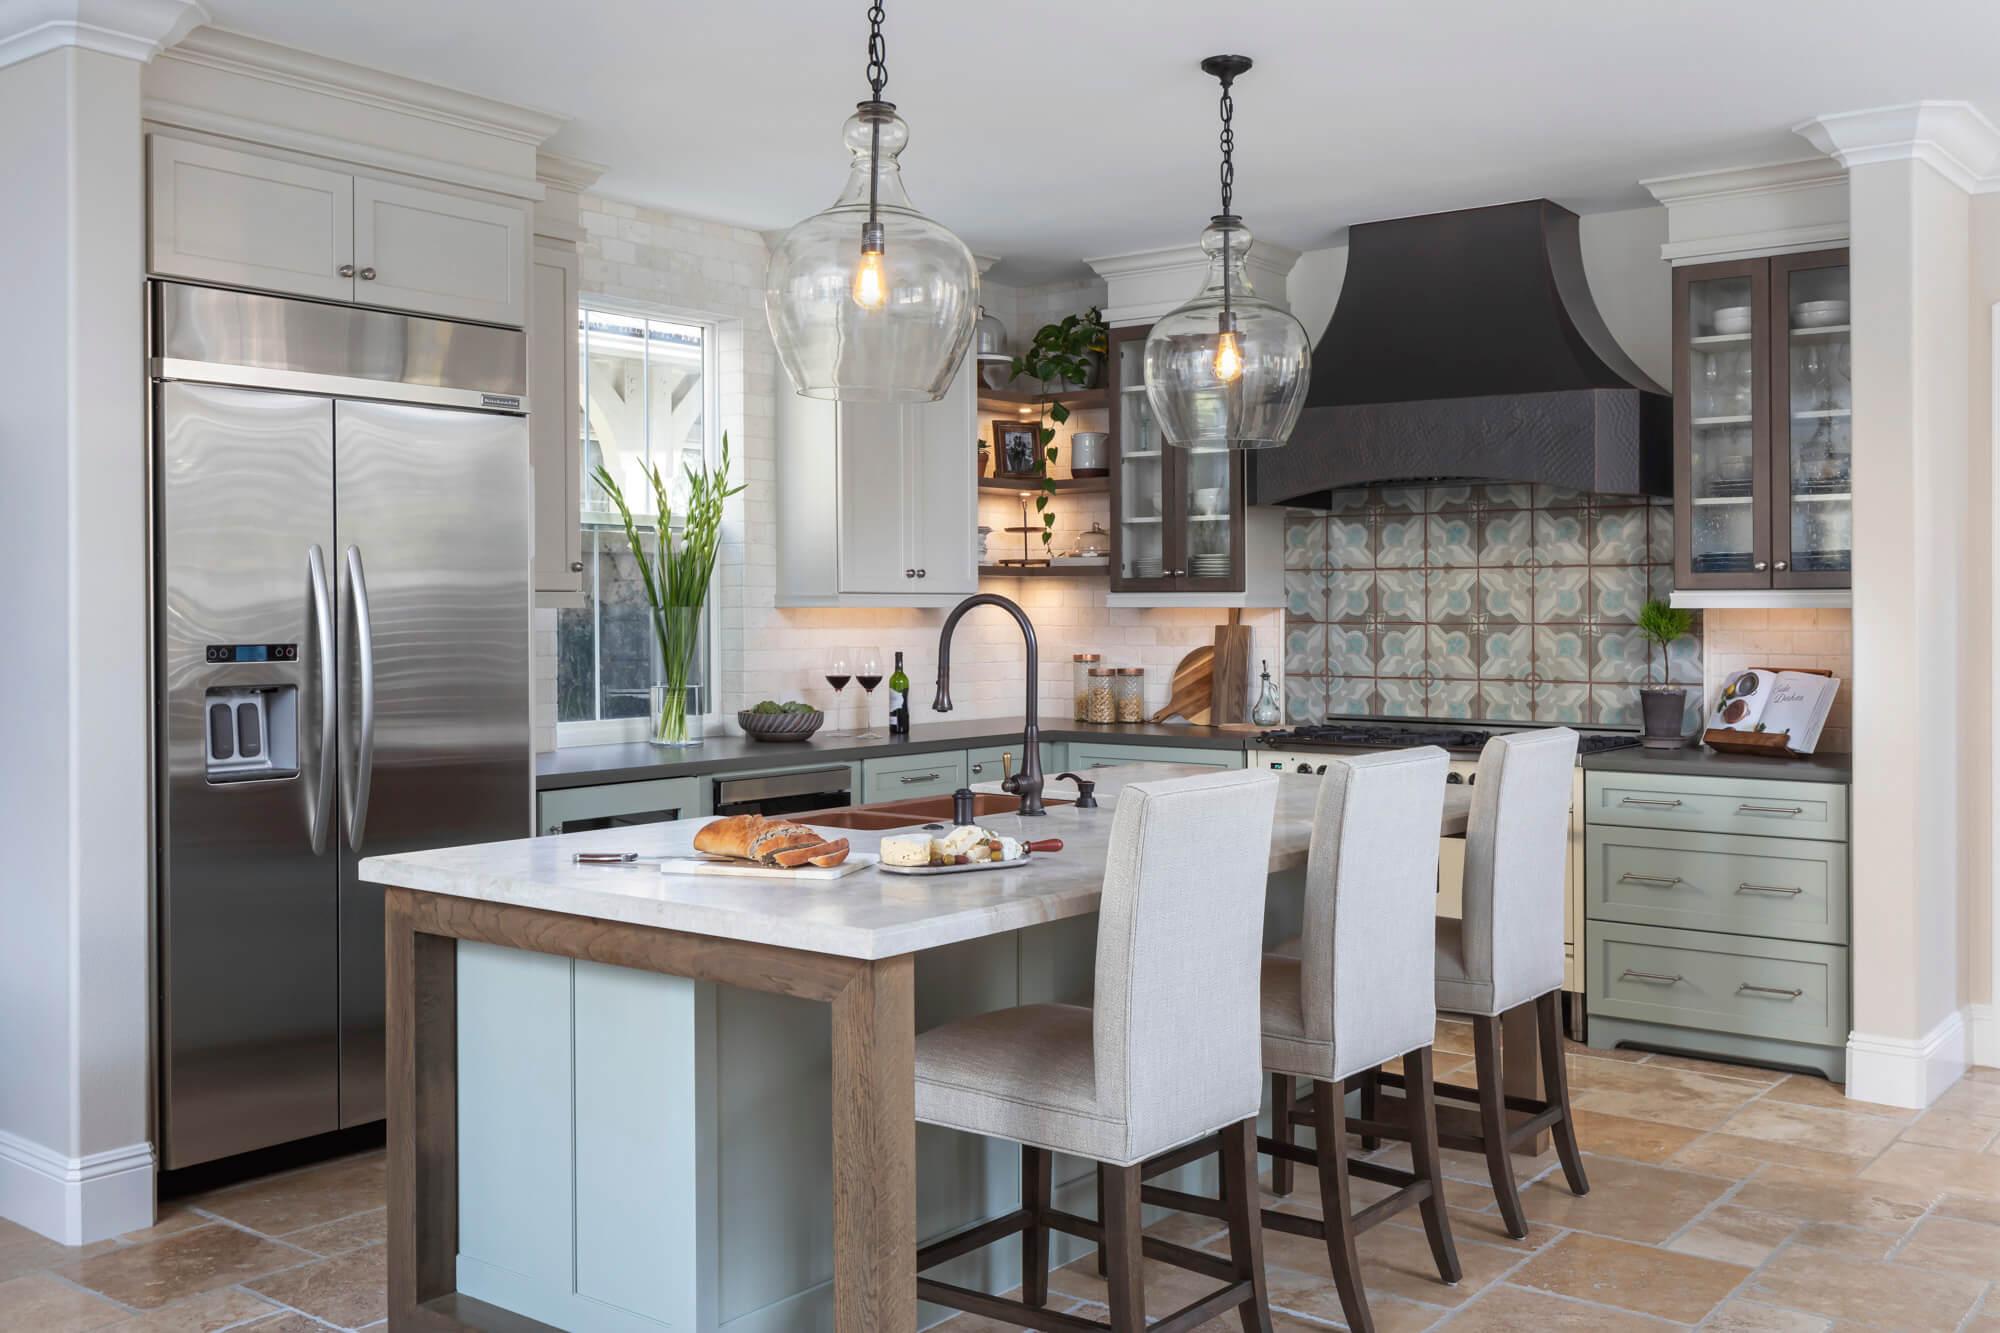 Natural-woods-kitchen-design-in-remodel